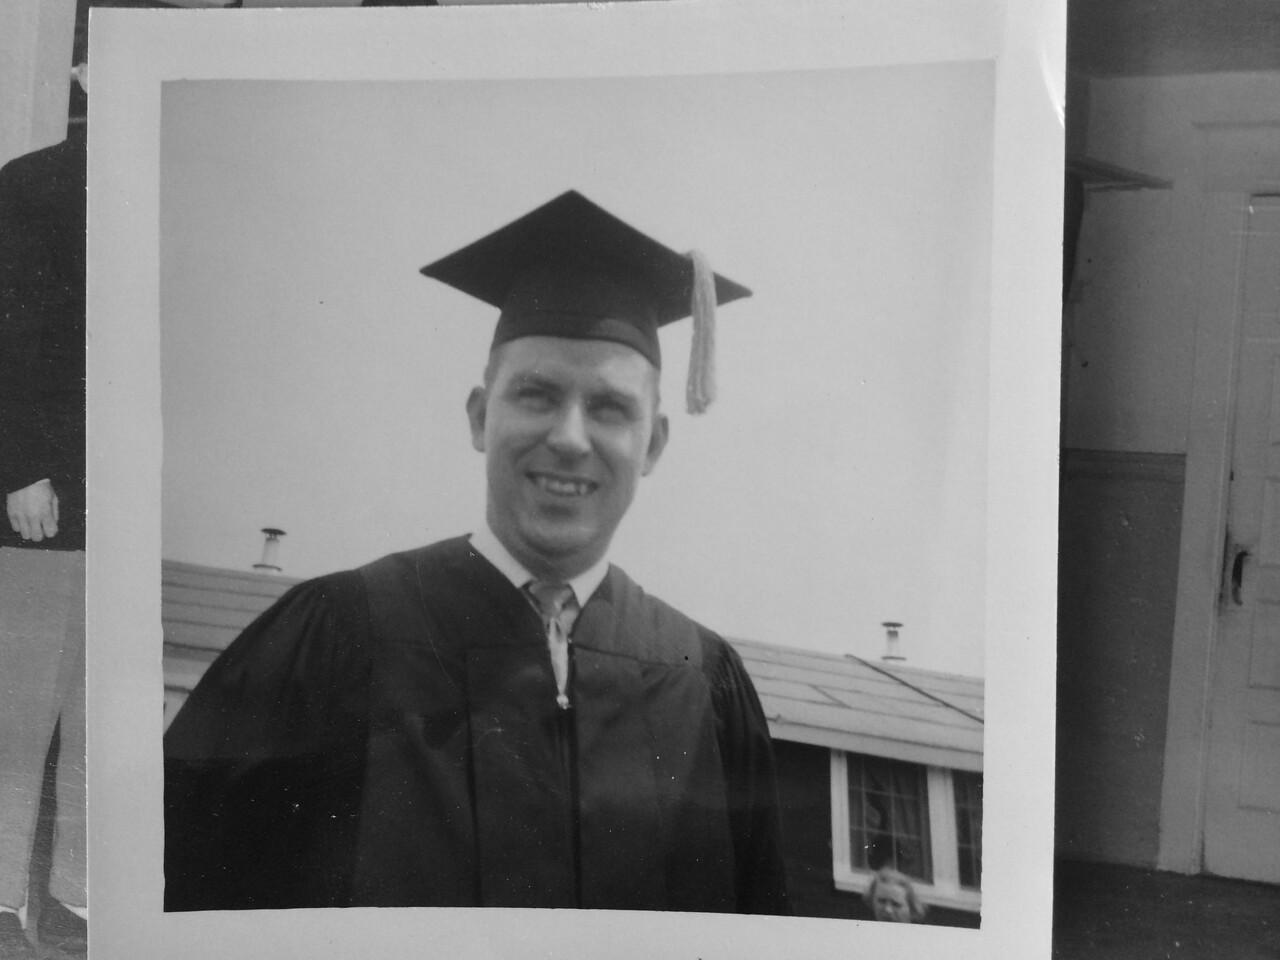 Frank at his Tri-State graduation.